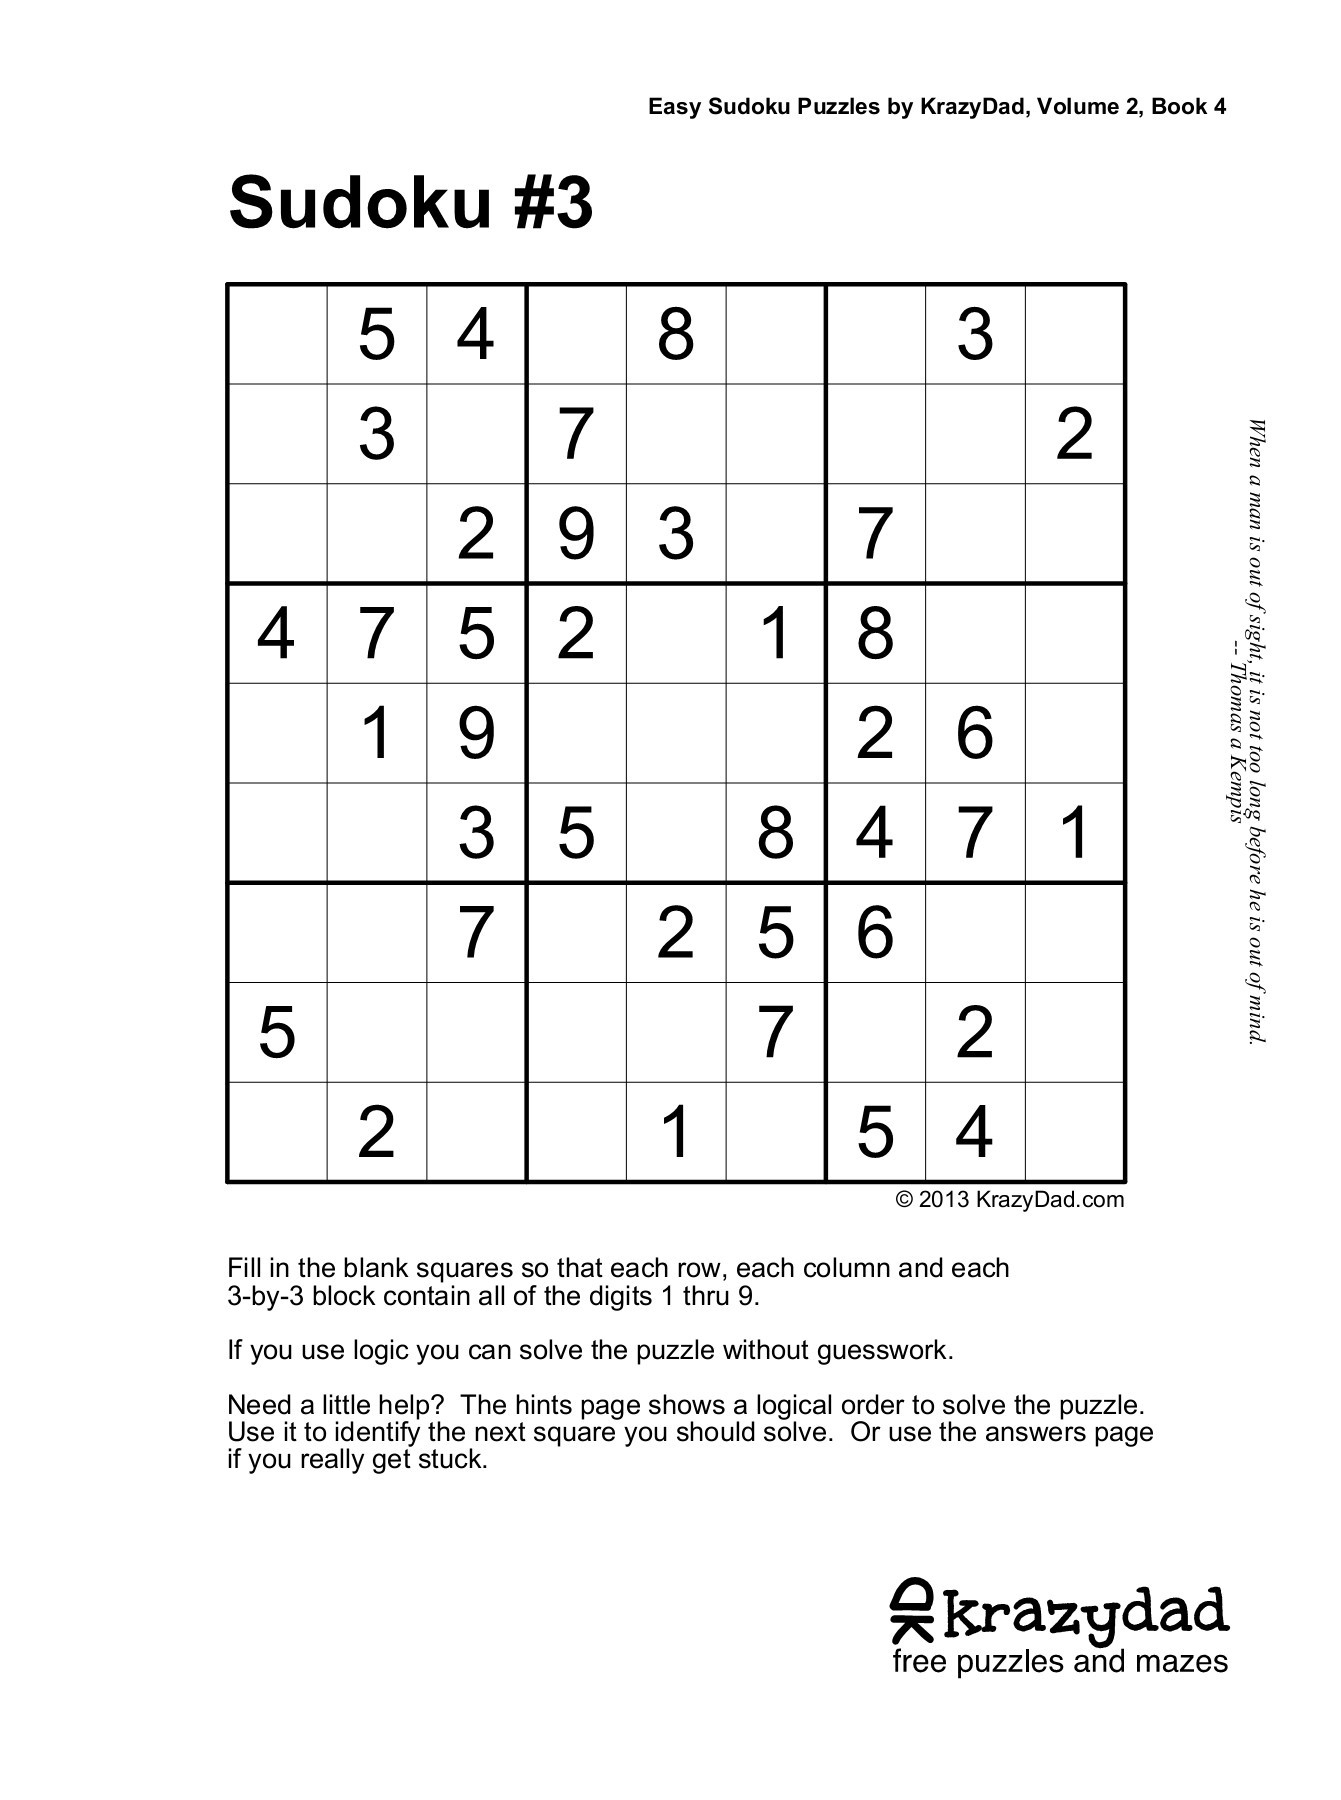 Easy Sudoku Puzzleskrazydad, Volume 2, Book 4 Pages 1